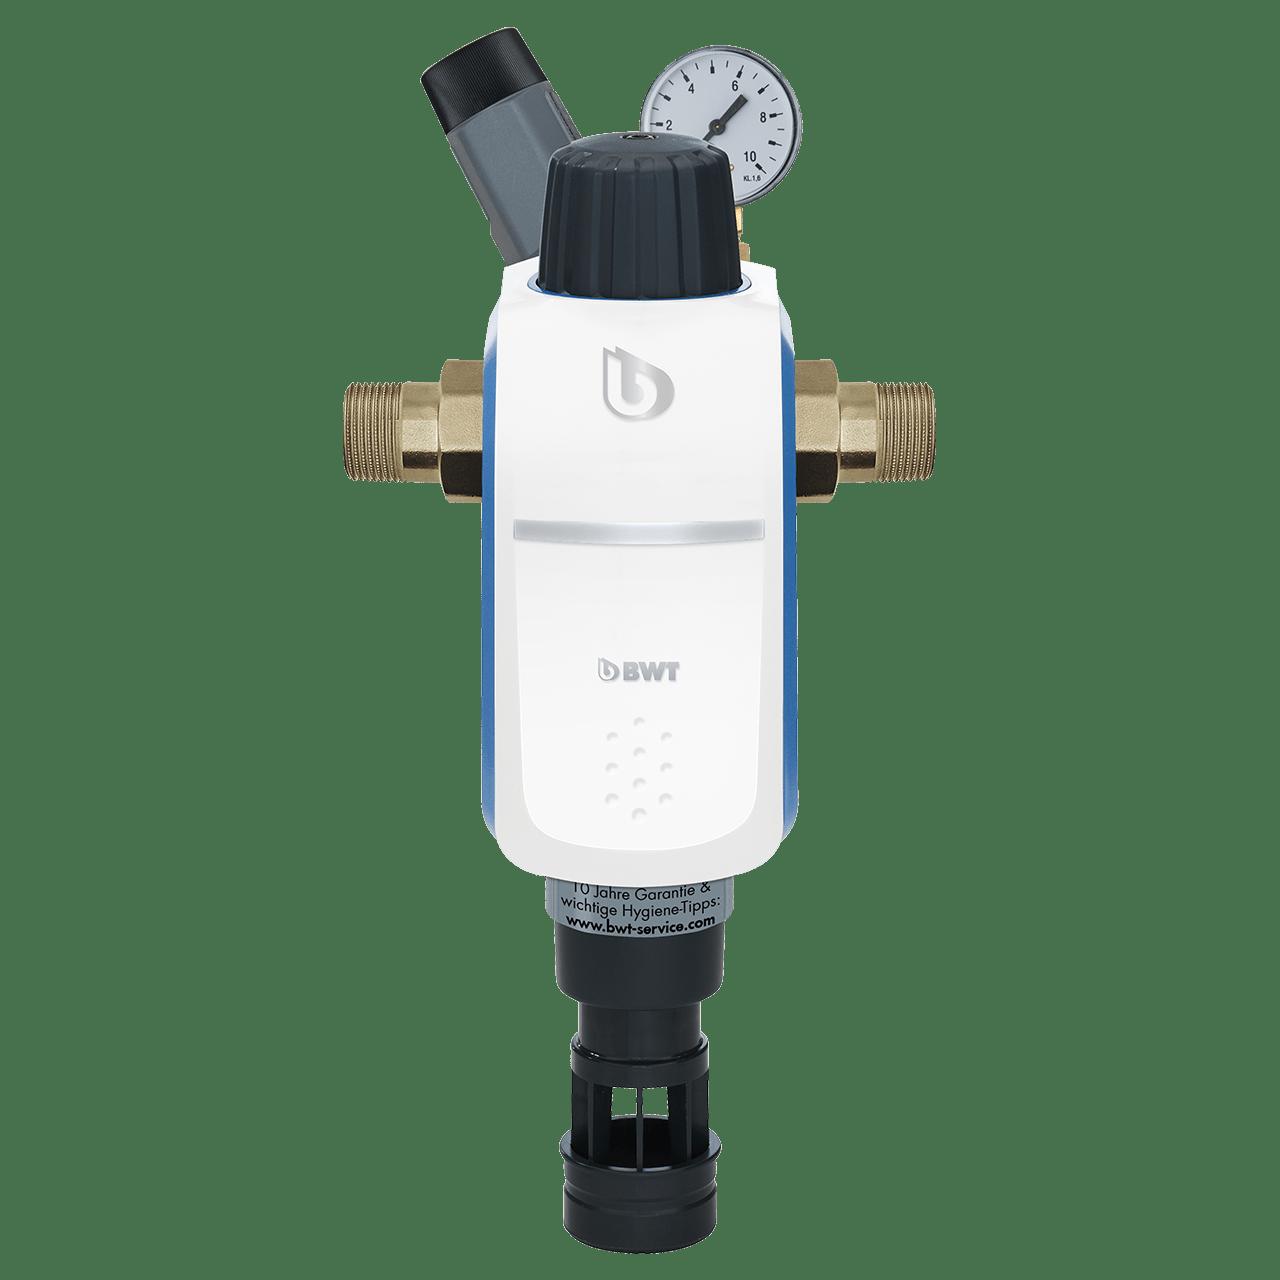 R1 RSF pressure regulator